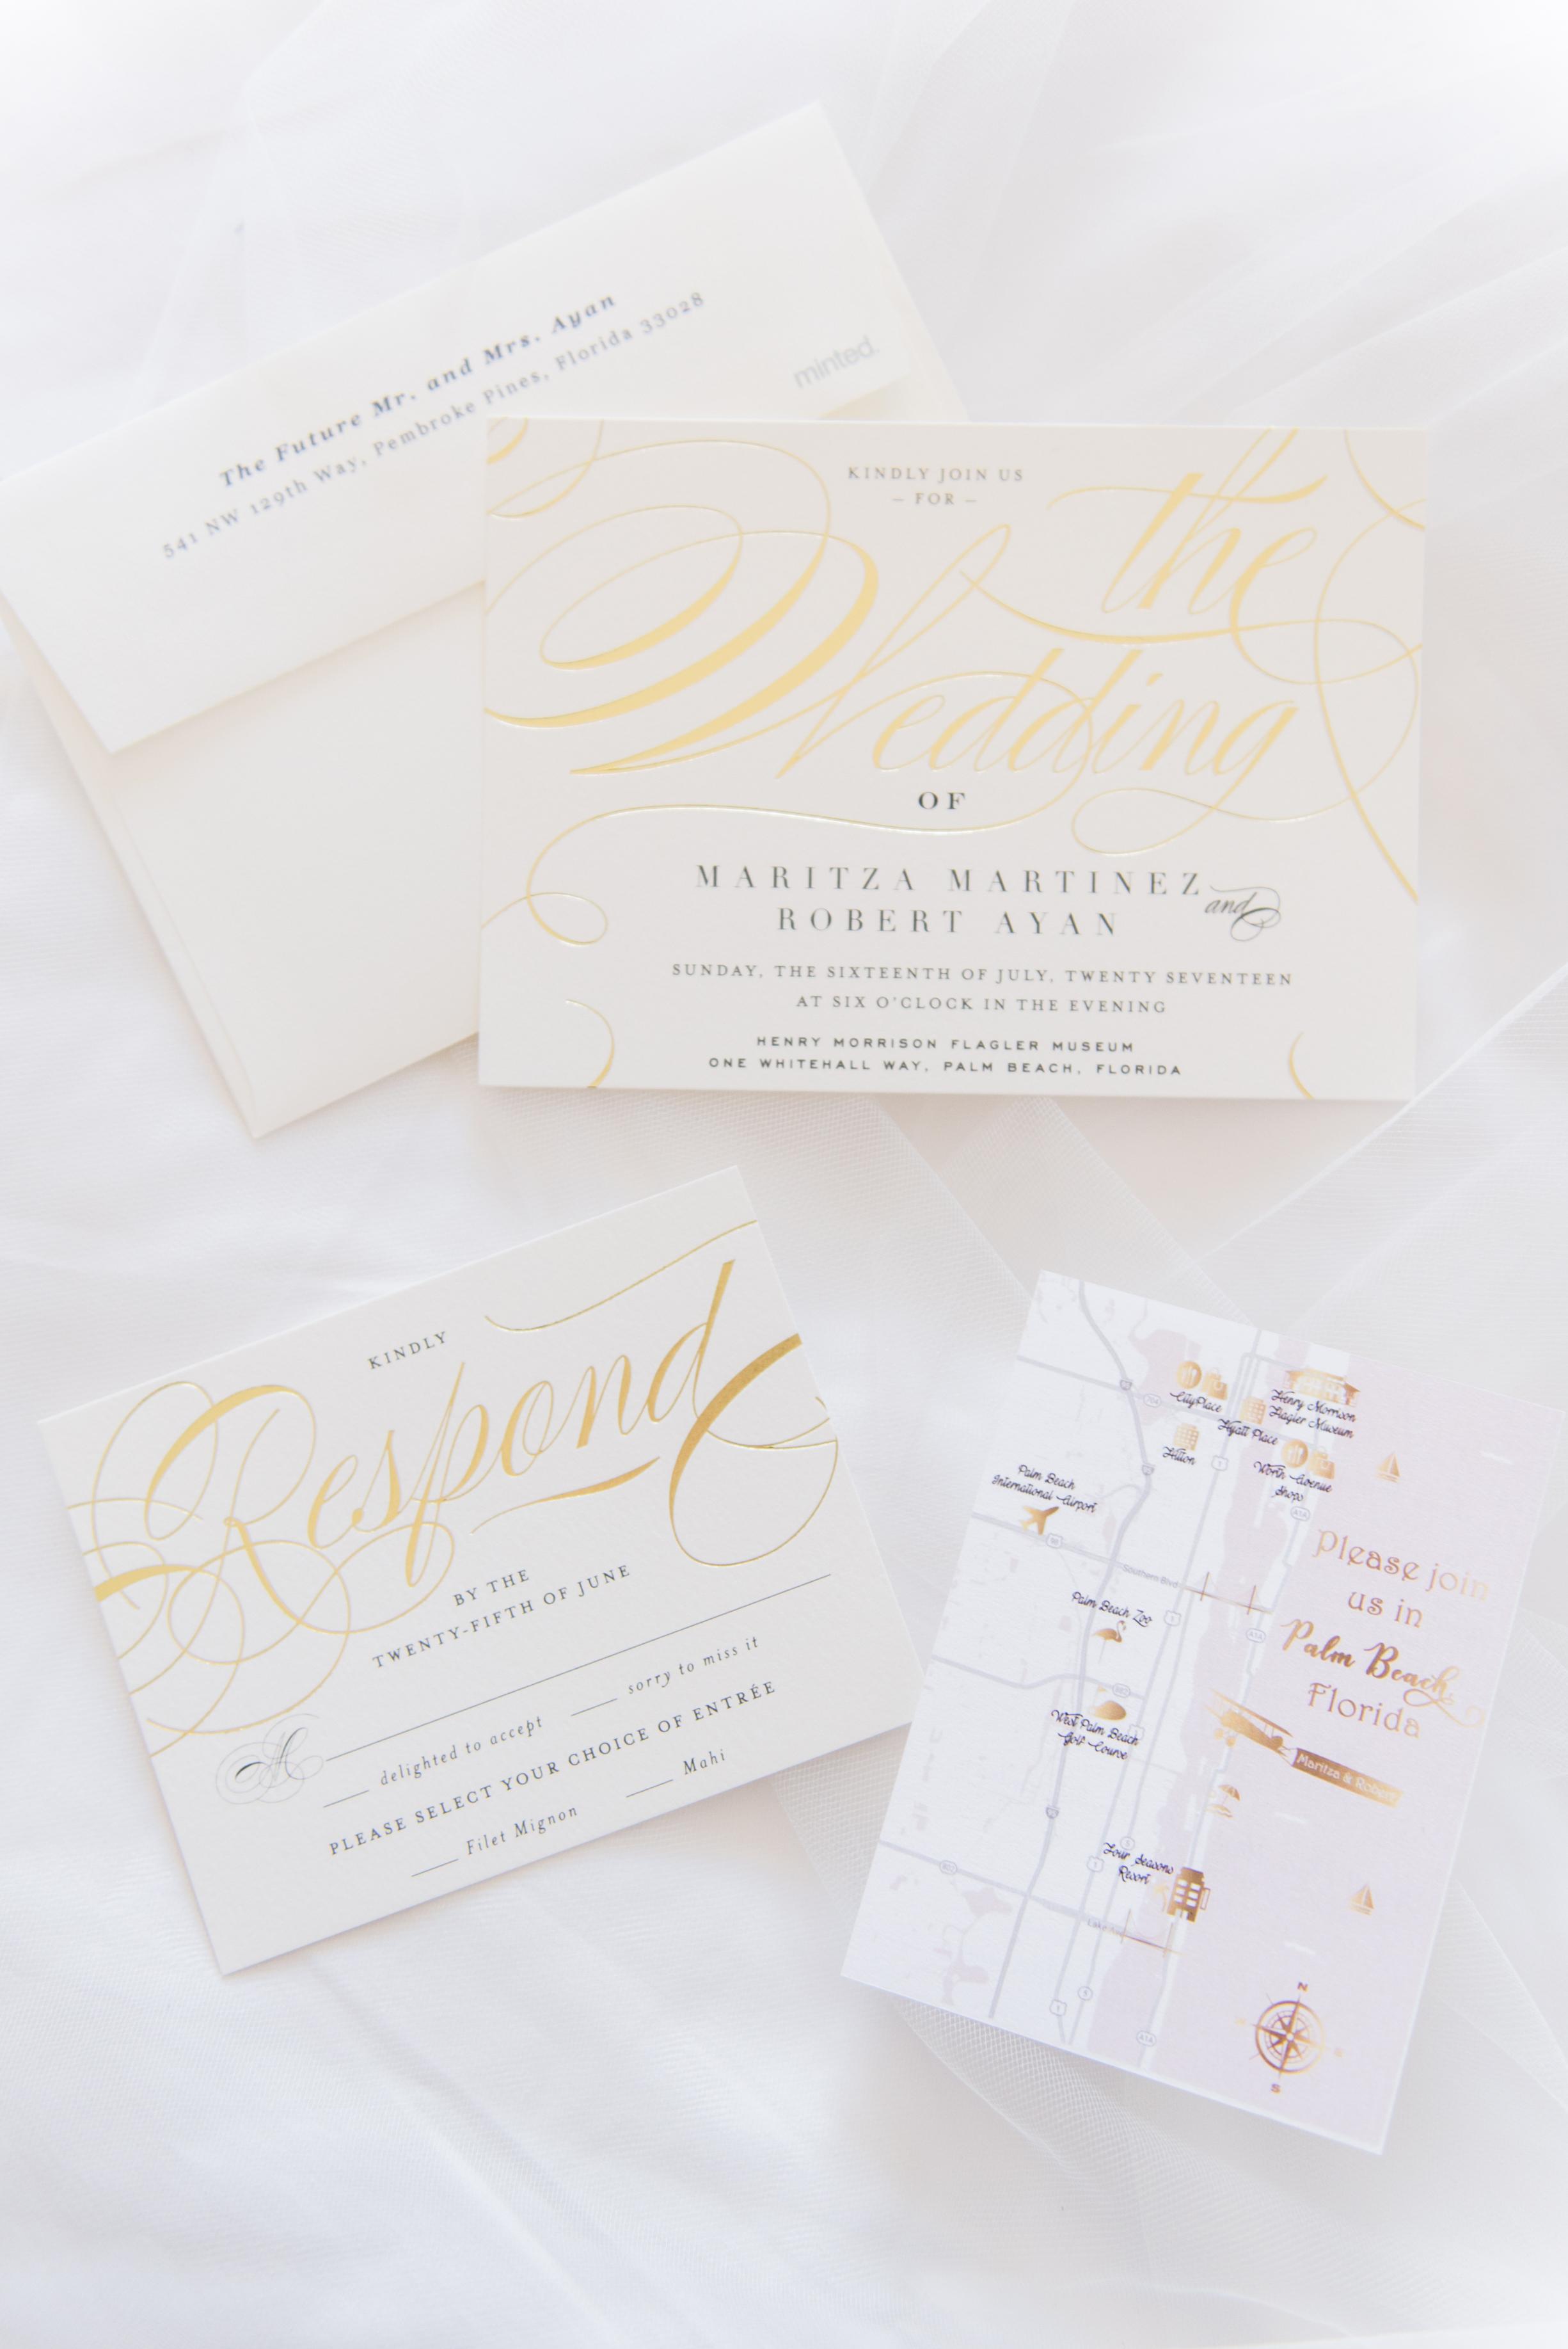 Gorgeous Gold and White Wedding Invitations - Flagler Museum Palm Beach Wedding Venue - The Overwhelmed Bride Wedding Blog